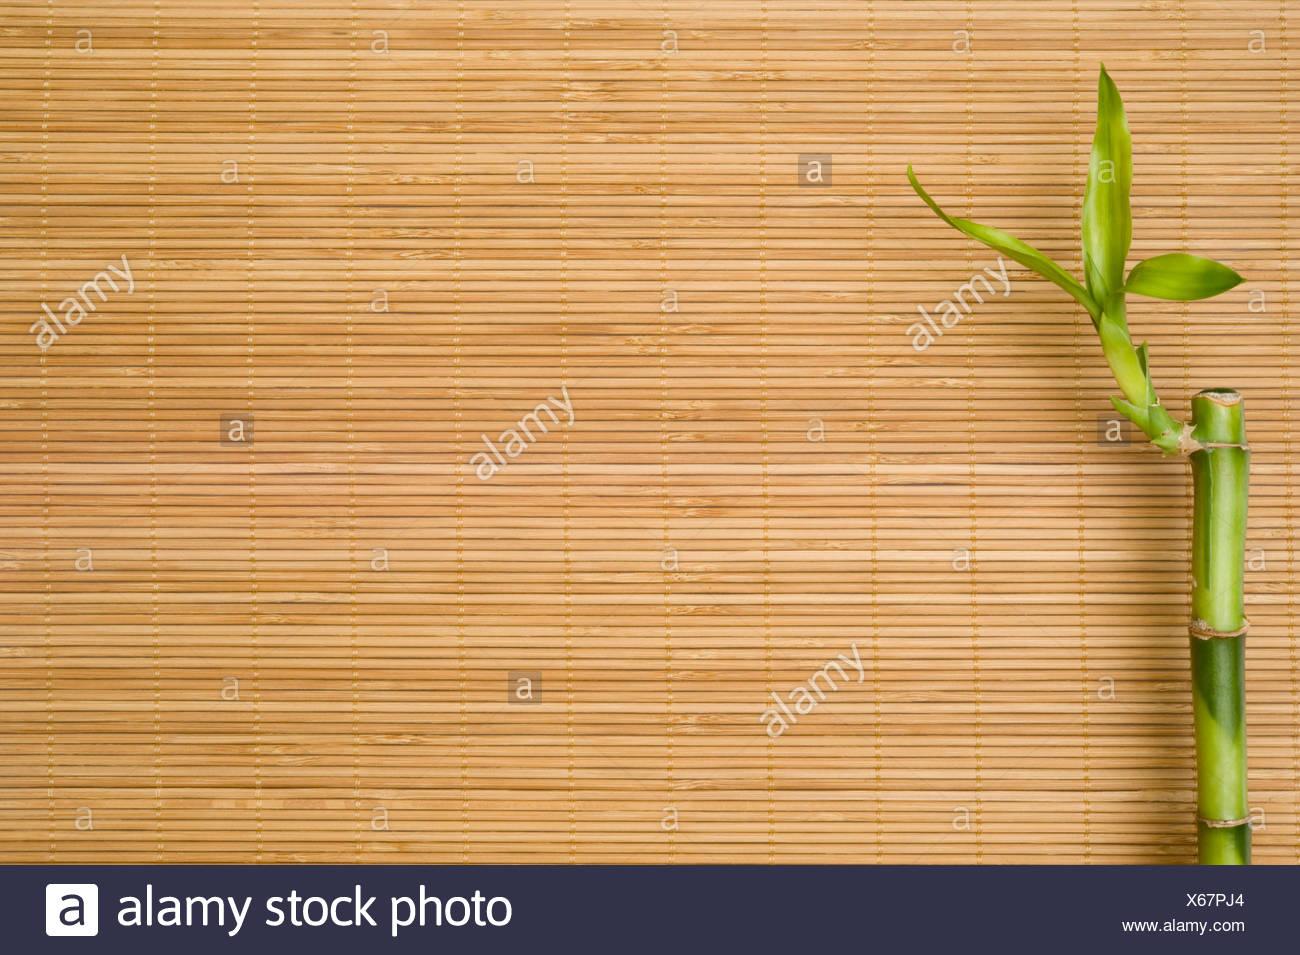 wellness bamboo bast - Stock Image